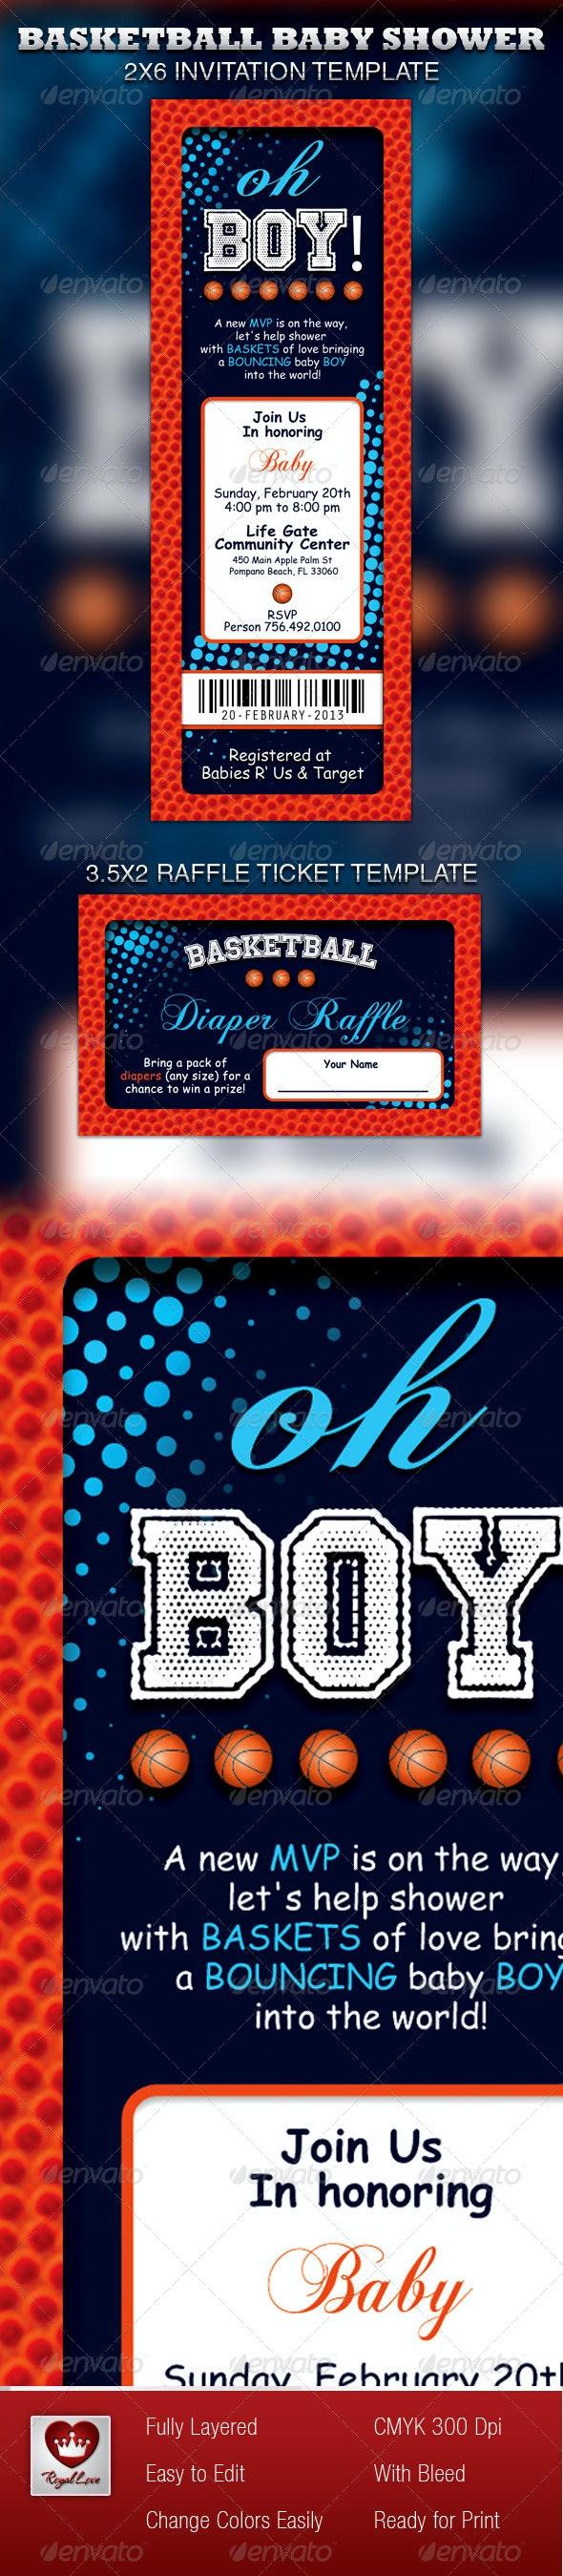 Basketball Baby Shower Invitation & Raffle Ticket - Invitations Cards & Invites